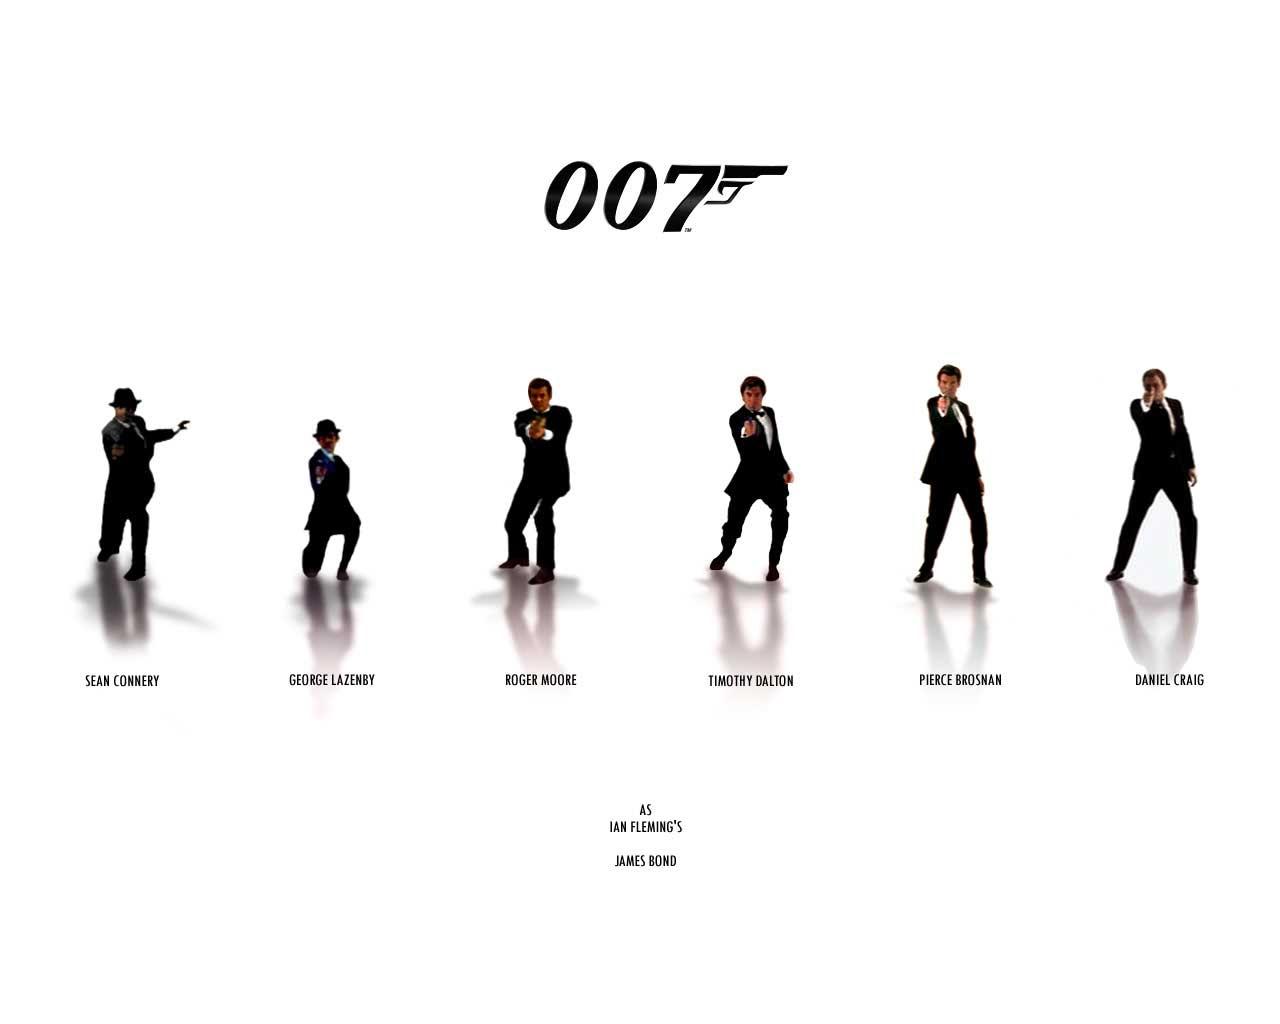 007-evolution